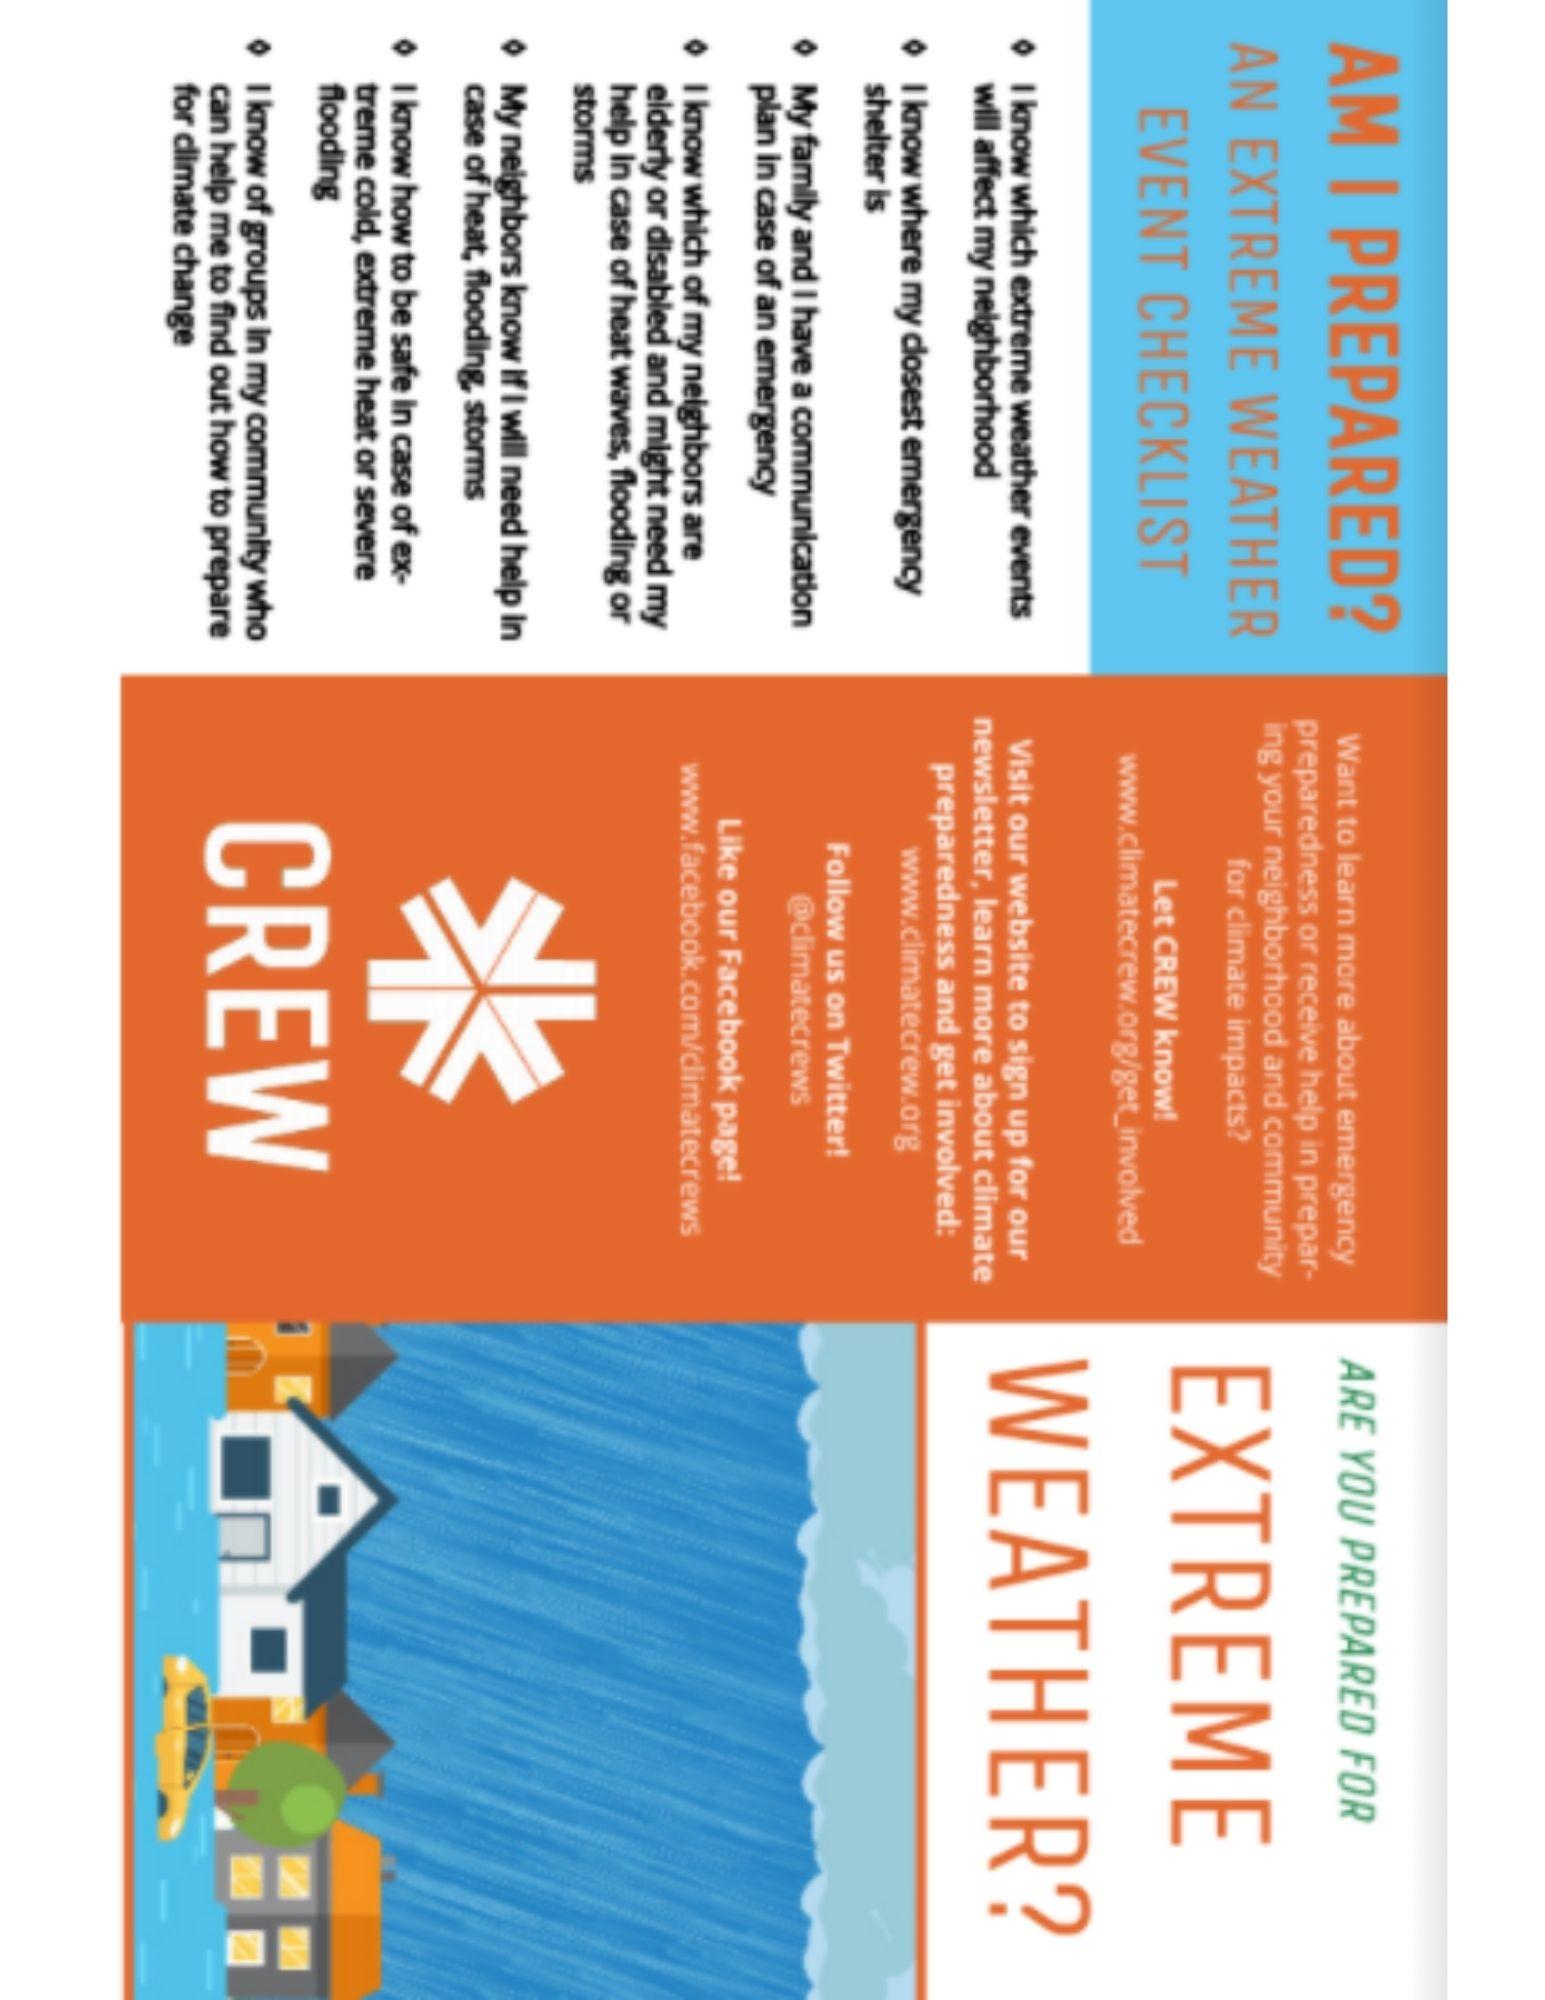 Extreme Weather Preparation brochure